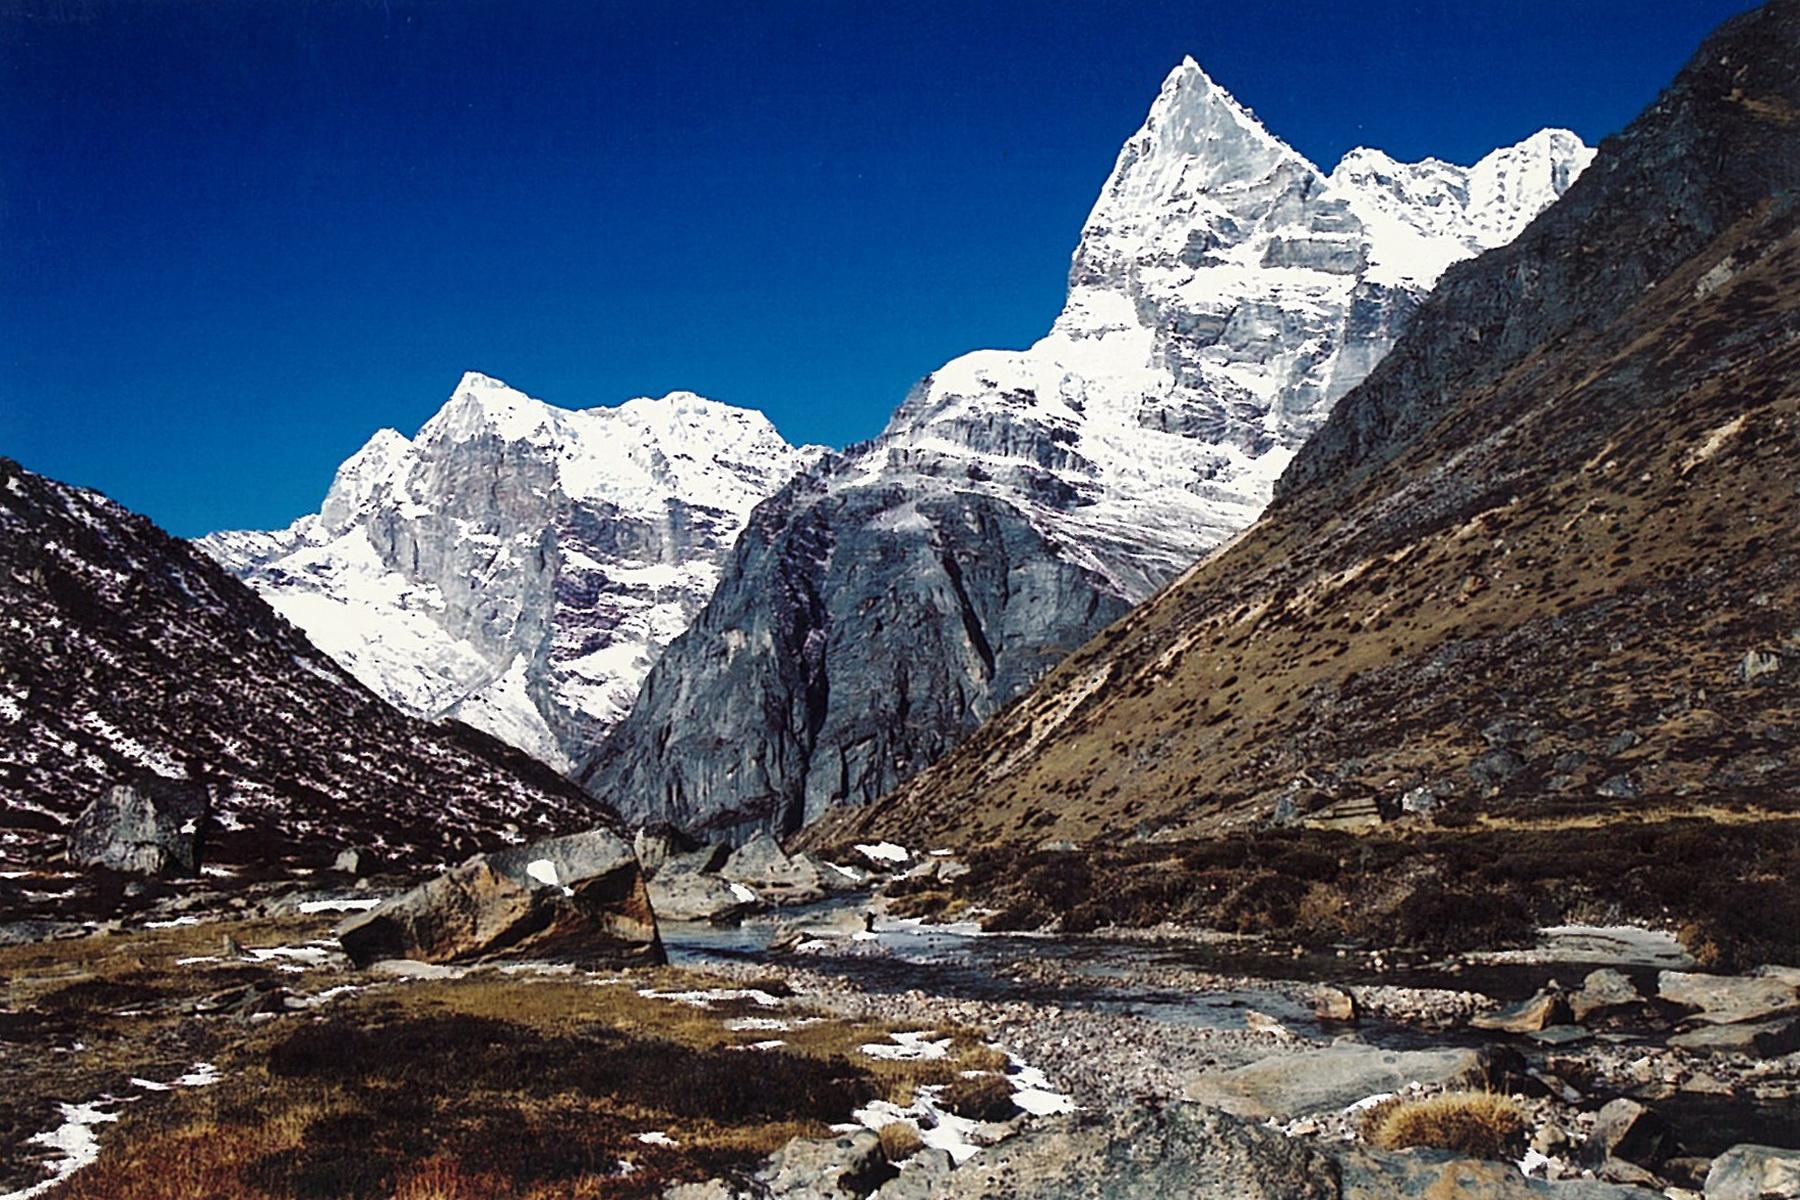 Upper Hinku Valley Mera Trekking Peak Trek Nepal Himalayas Hike Hiking